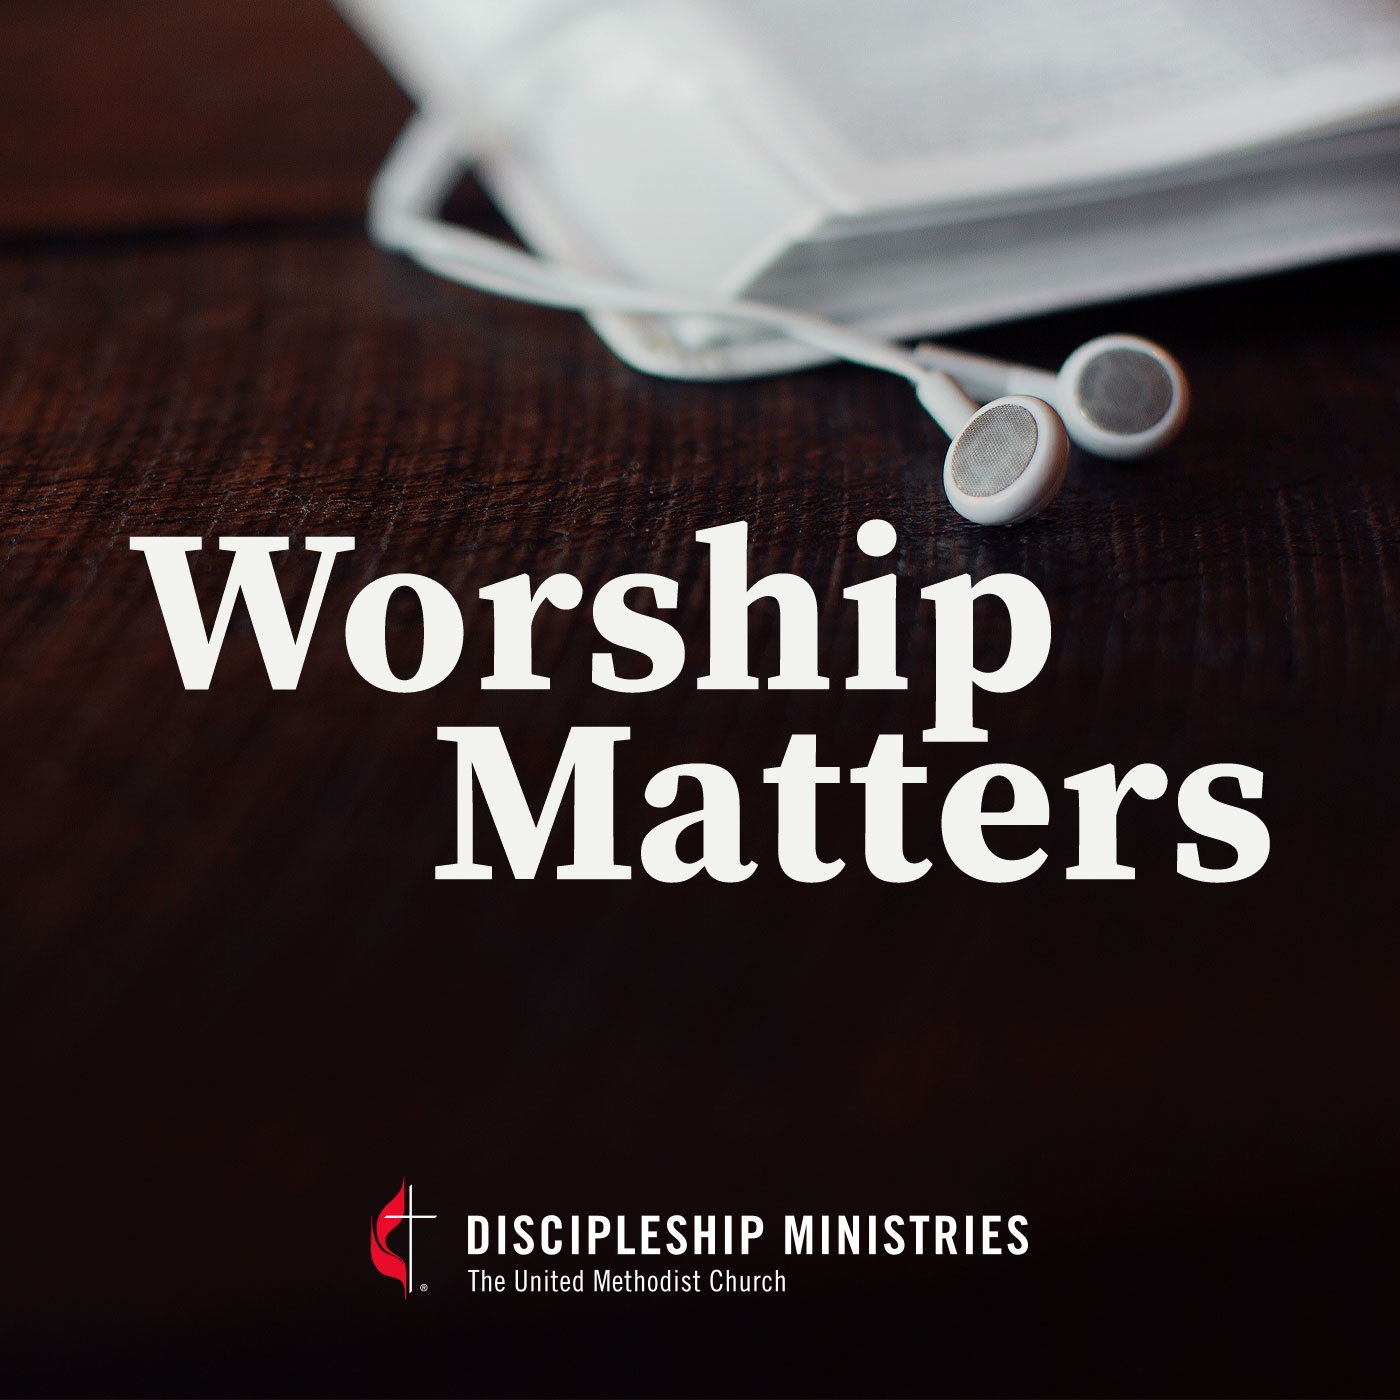 Discipleship Ministries | Worship Matters: Episode 01 - Epiphany  Common Lectionary 2020 Umc